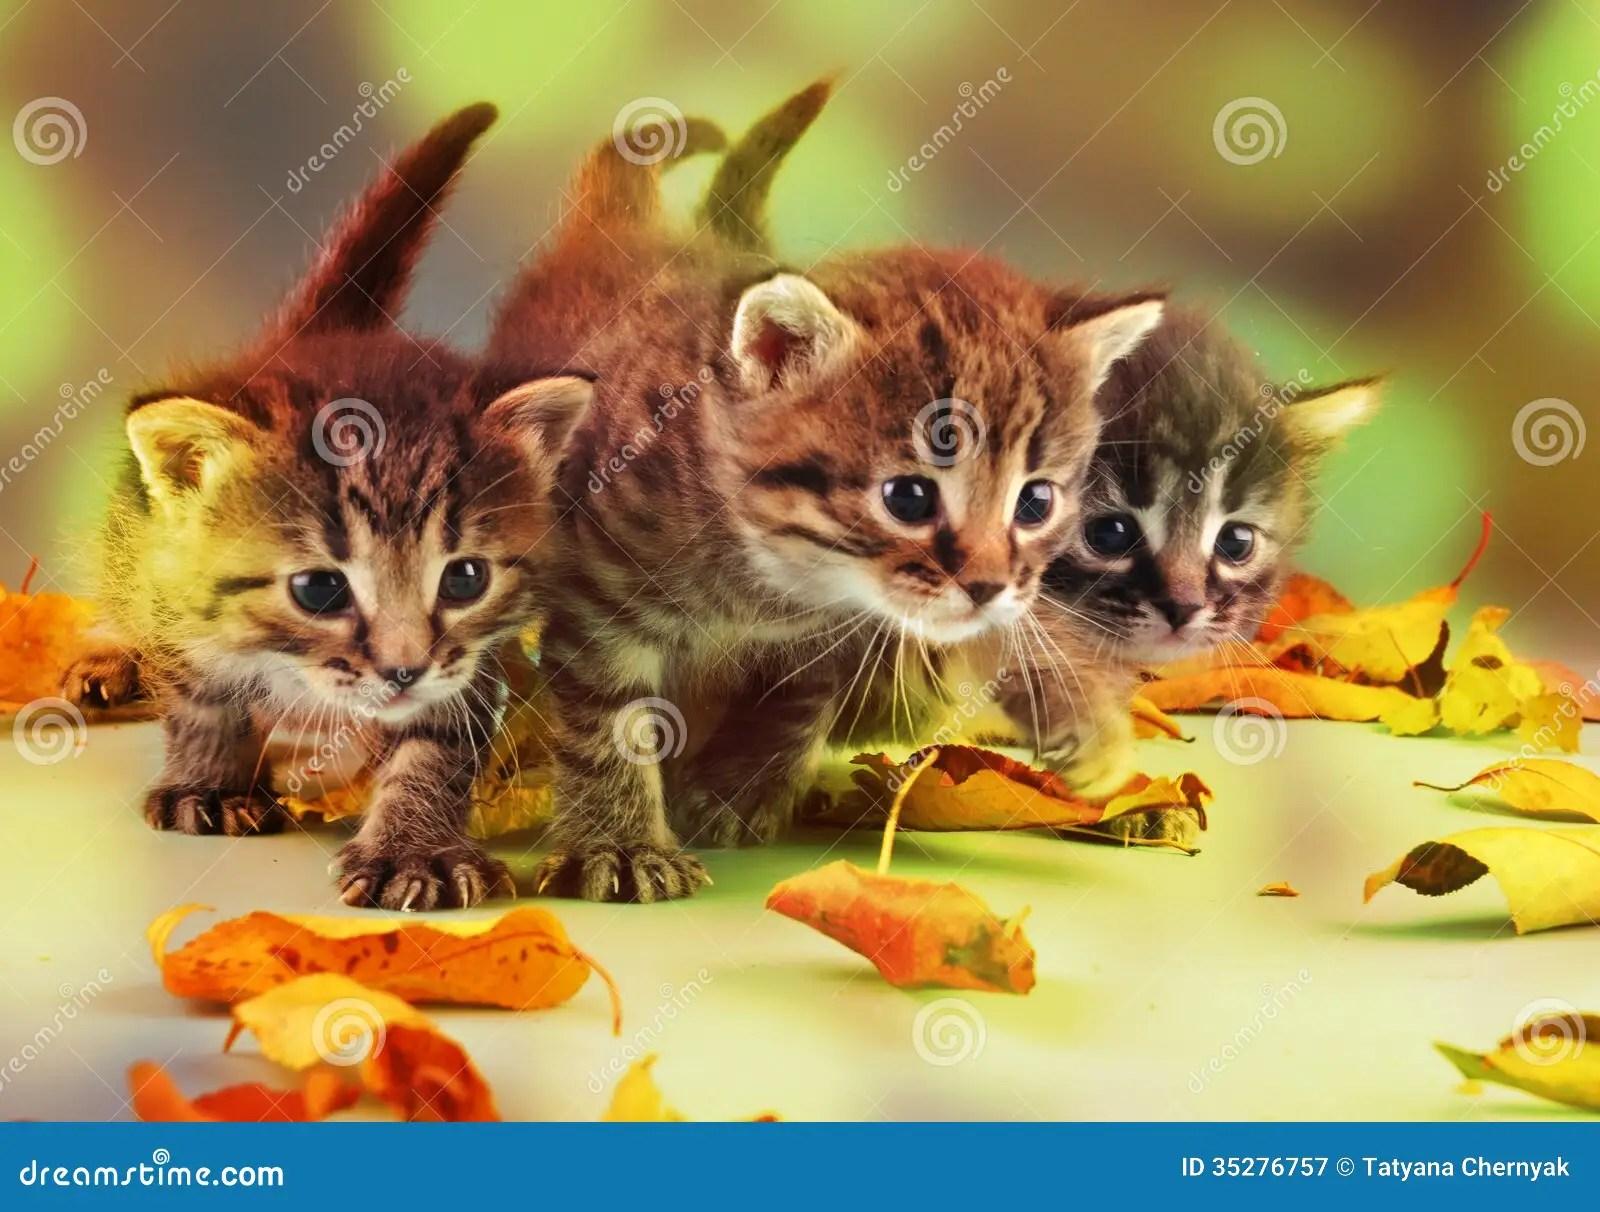 Fall Kitten Wallpaper Group Of Small Kittens In Autumn Leaves Stock Image